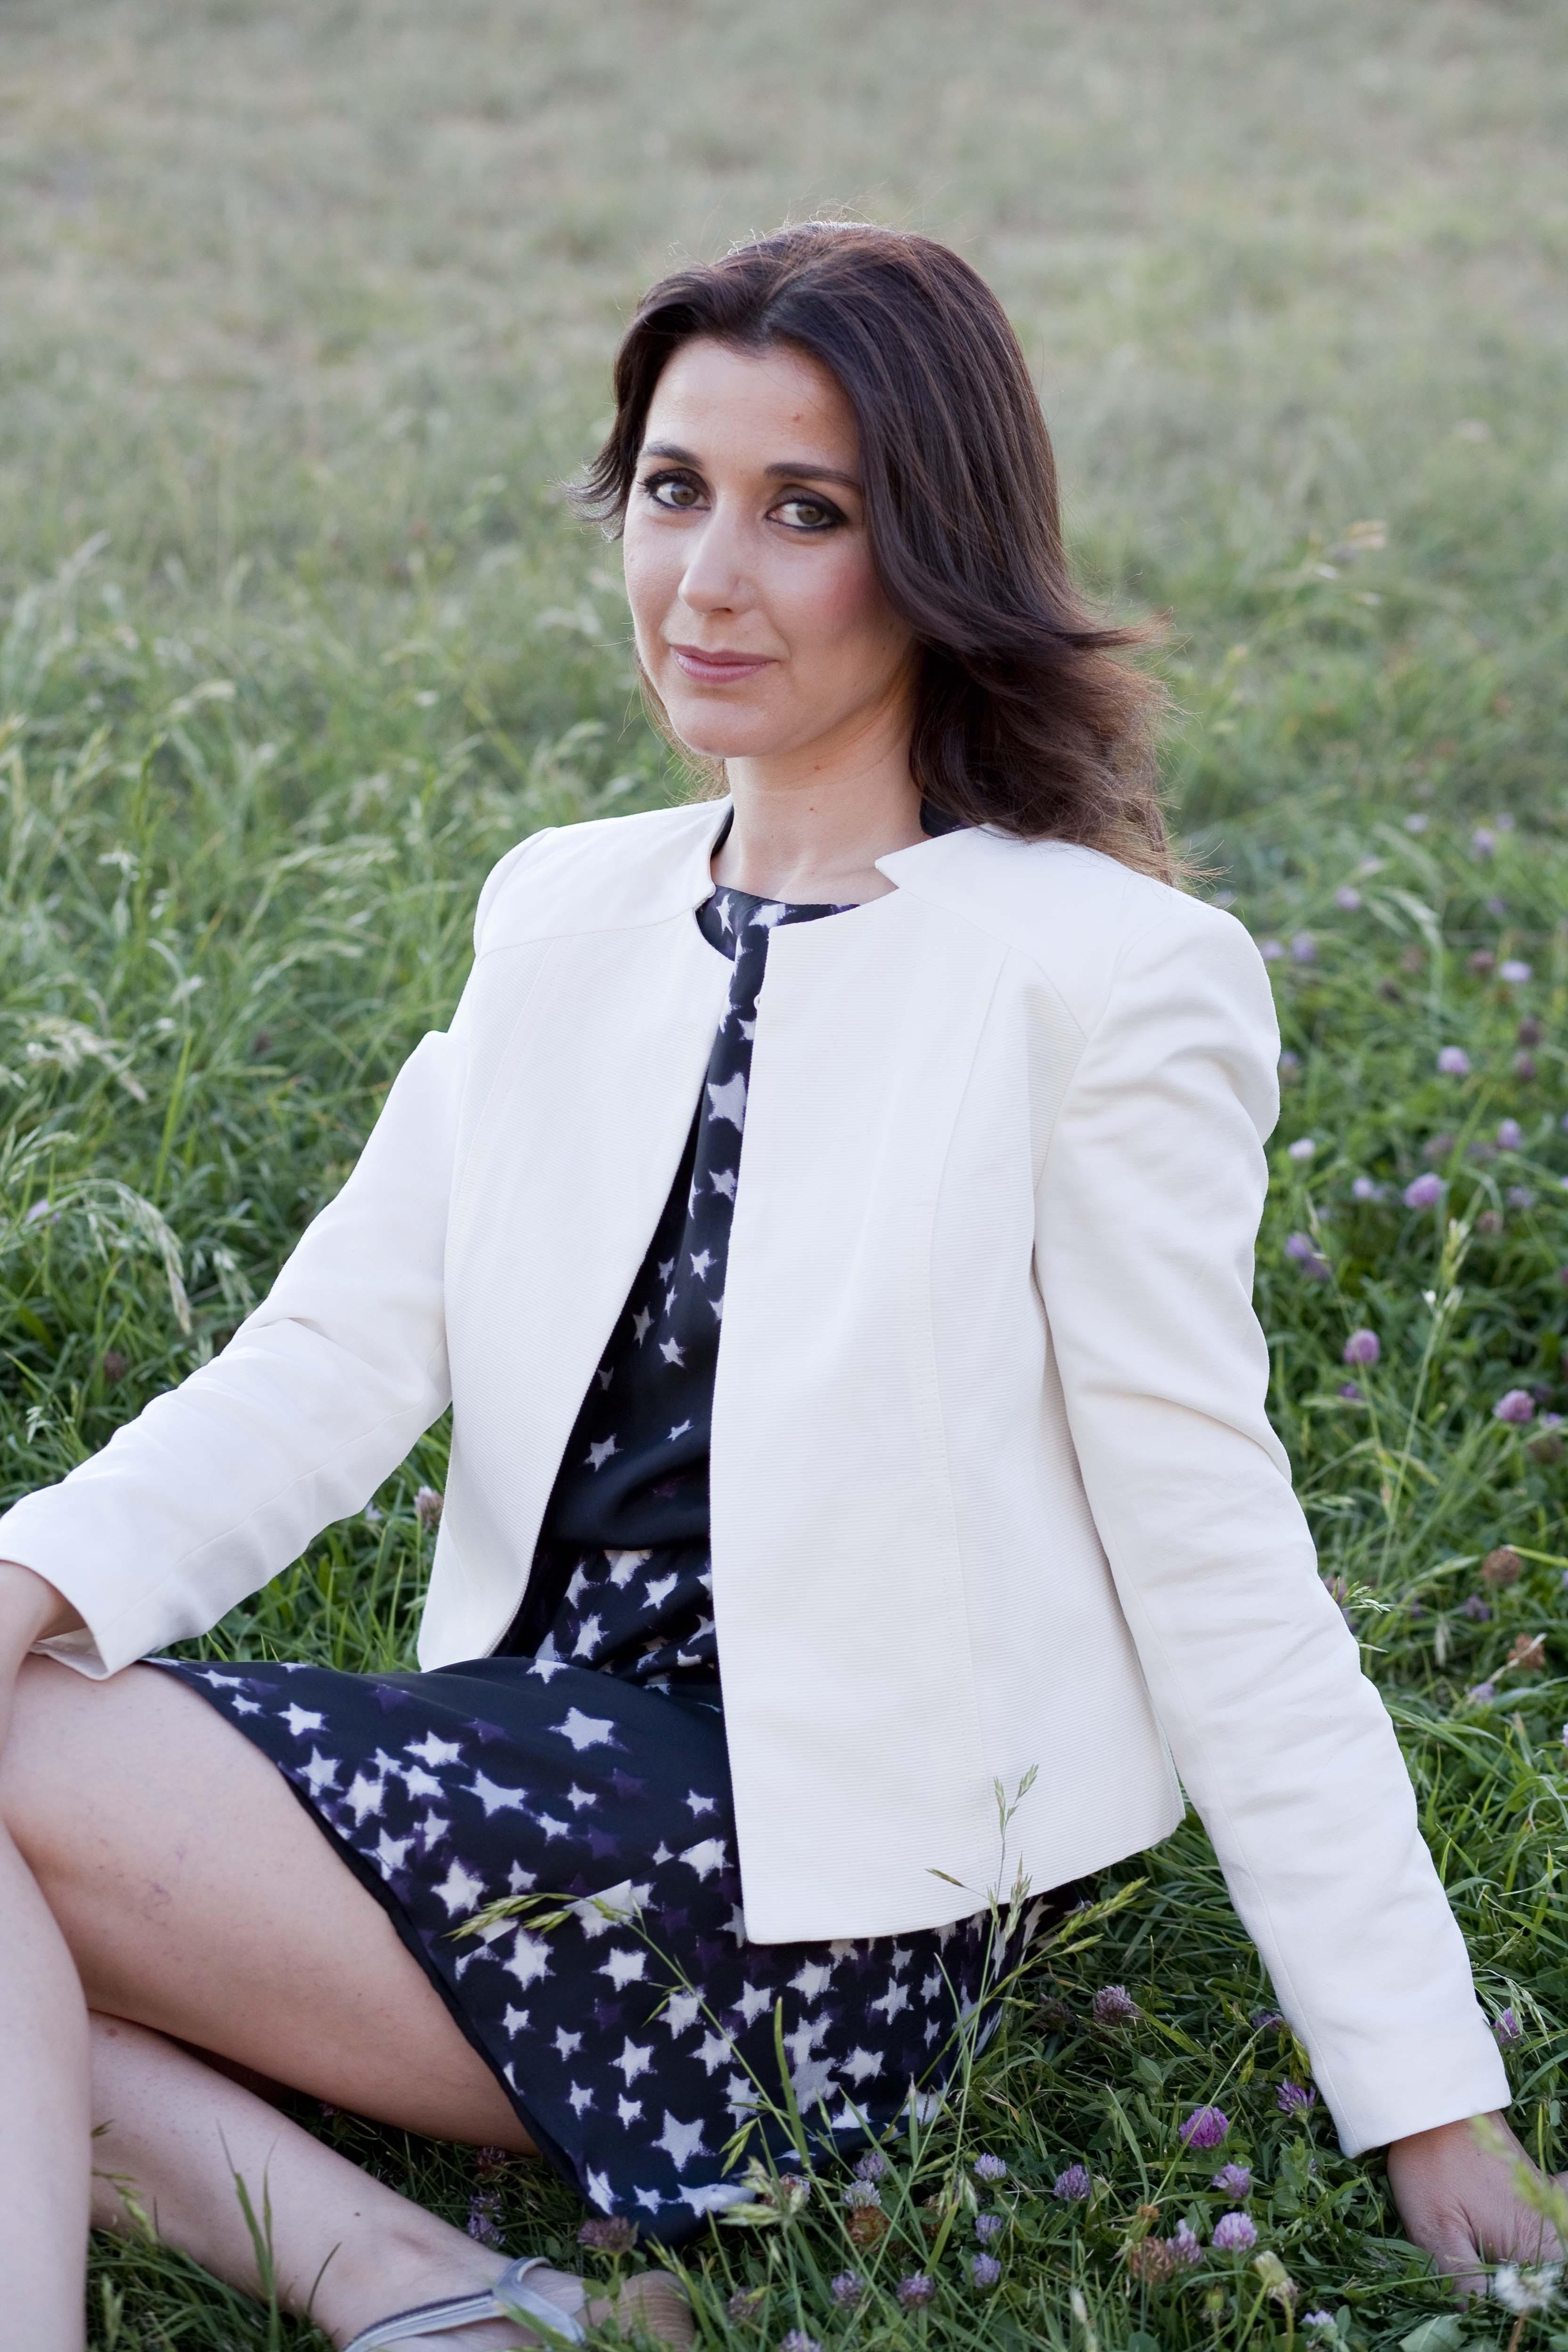 Cristina Muñoz - Directora de la Universidad de la Imagen